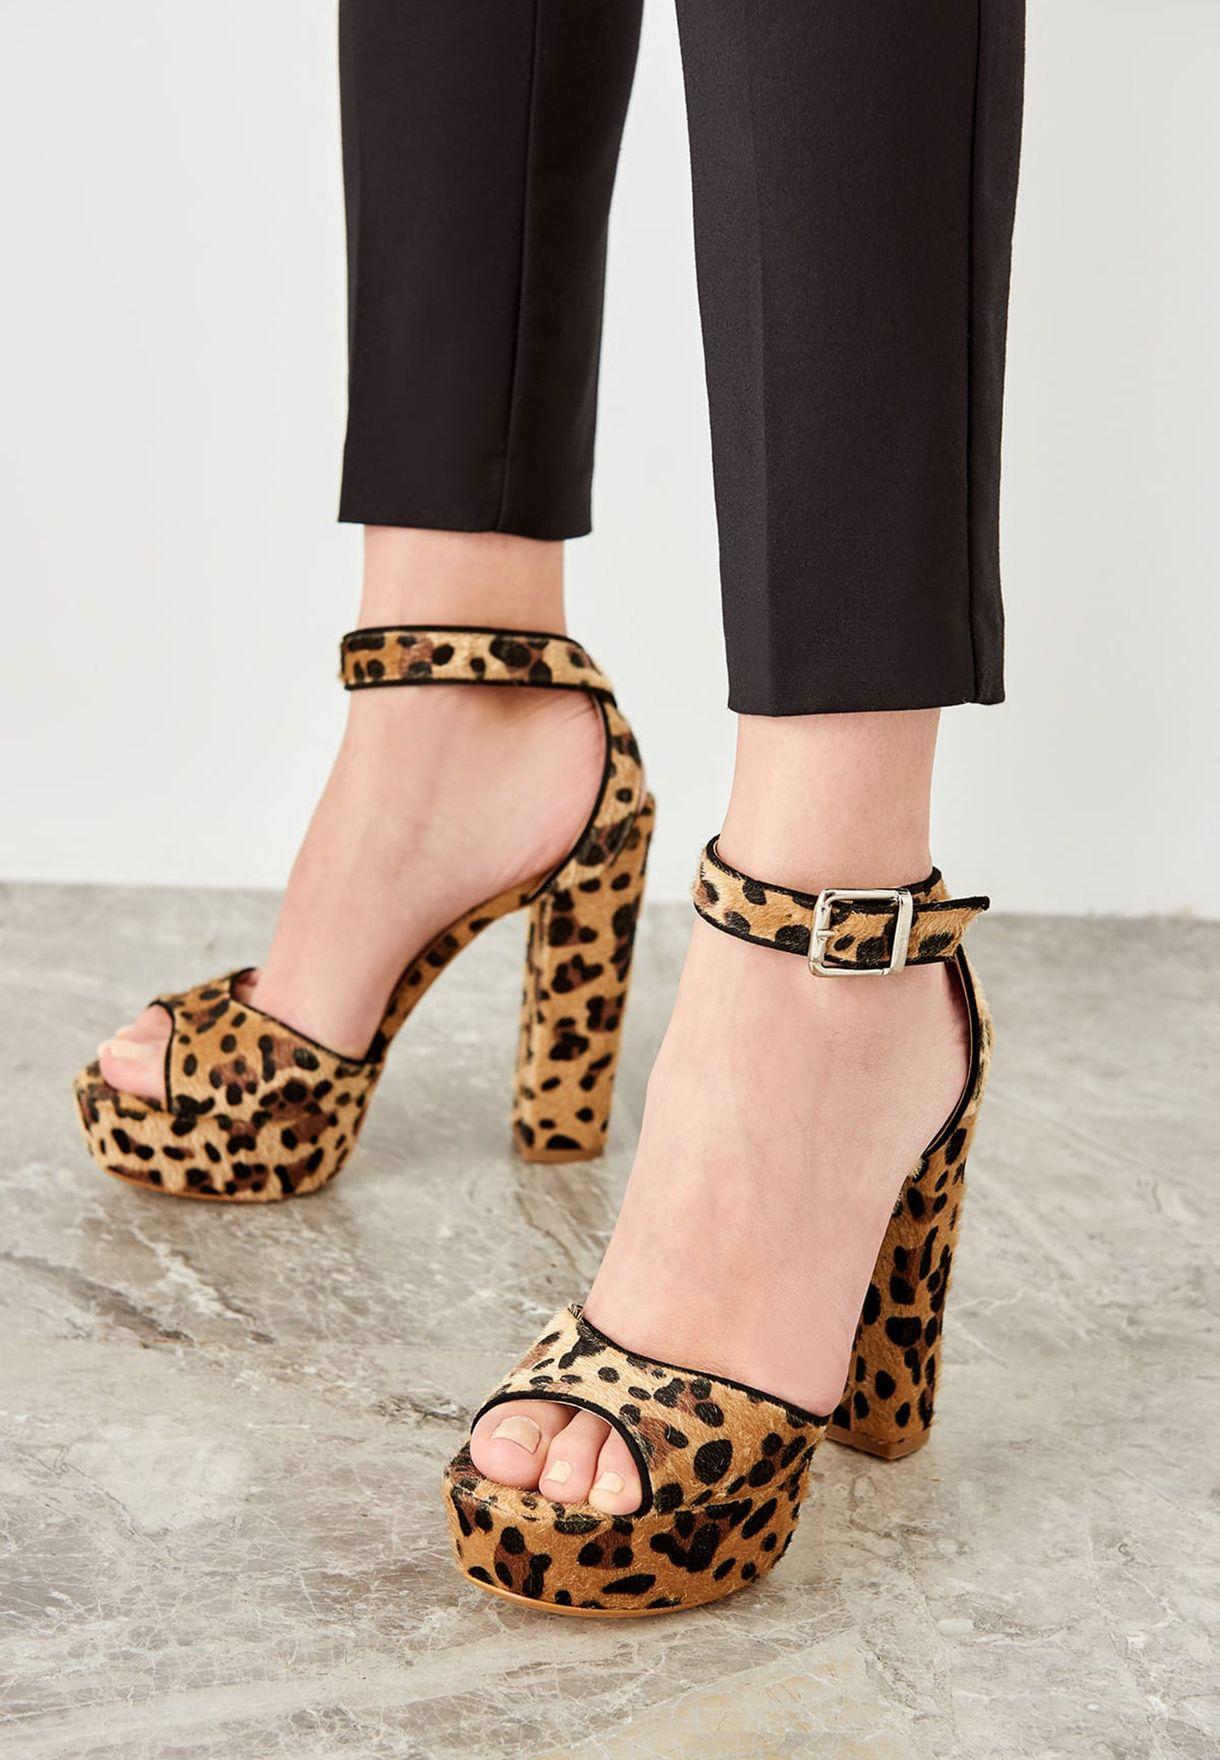 leopard print high heel sandals